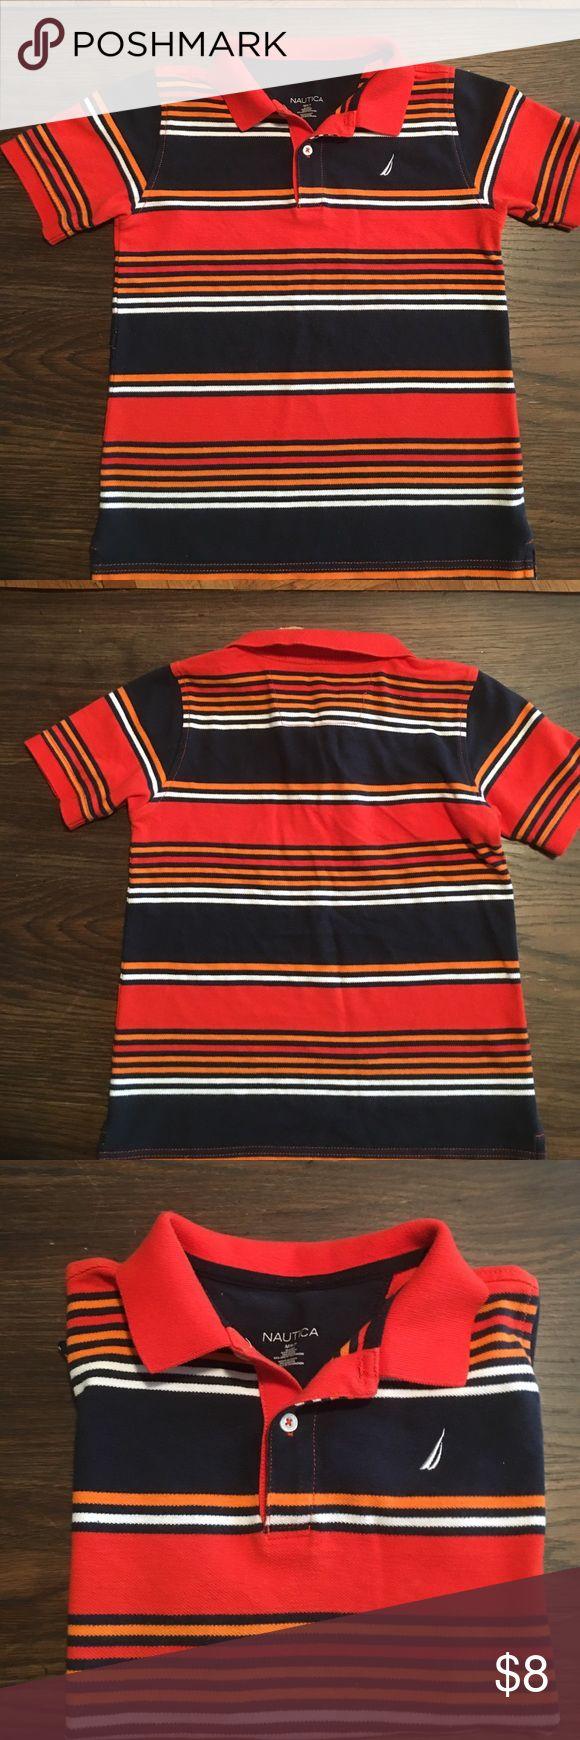 Boys Nautical shirt Boys Nautica Short sleeve shirt. In good condition size M (6-7) Nautica Shirts & Tops Polos